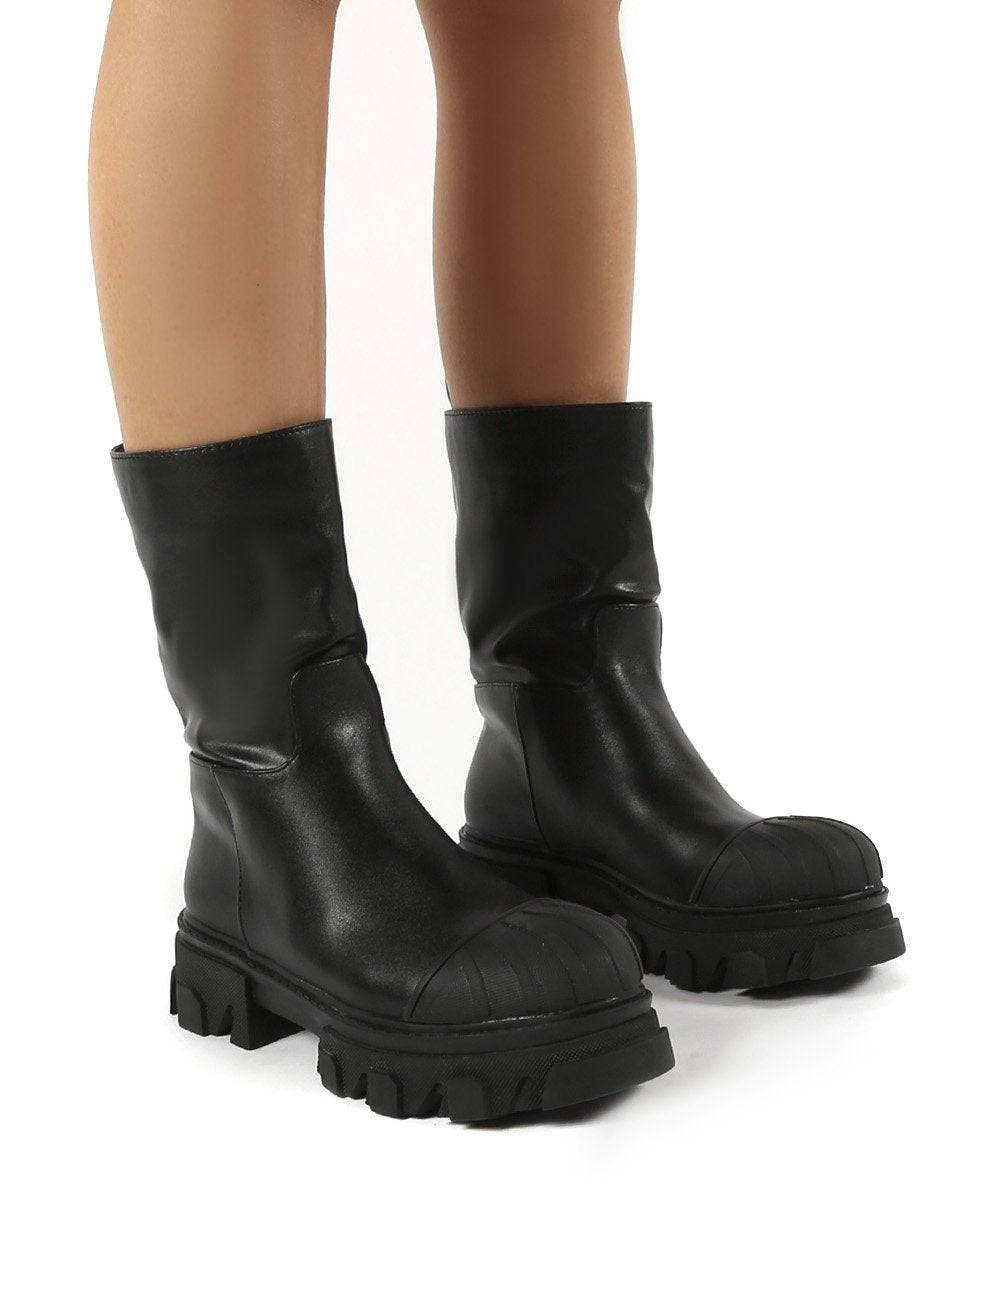 Public Desire US Showdown Black Calf High Chunky Sole Boots - US 11